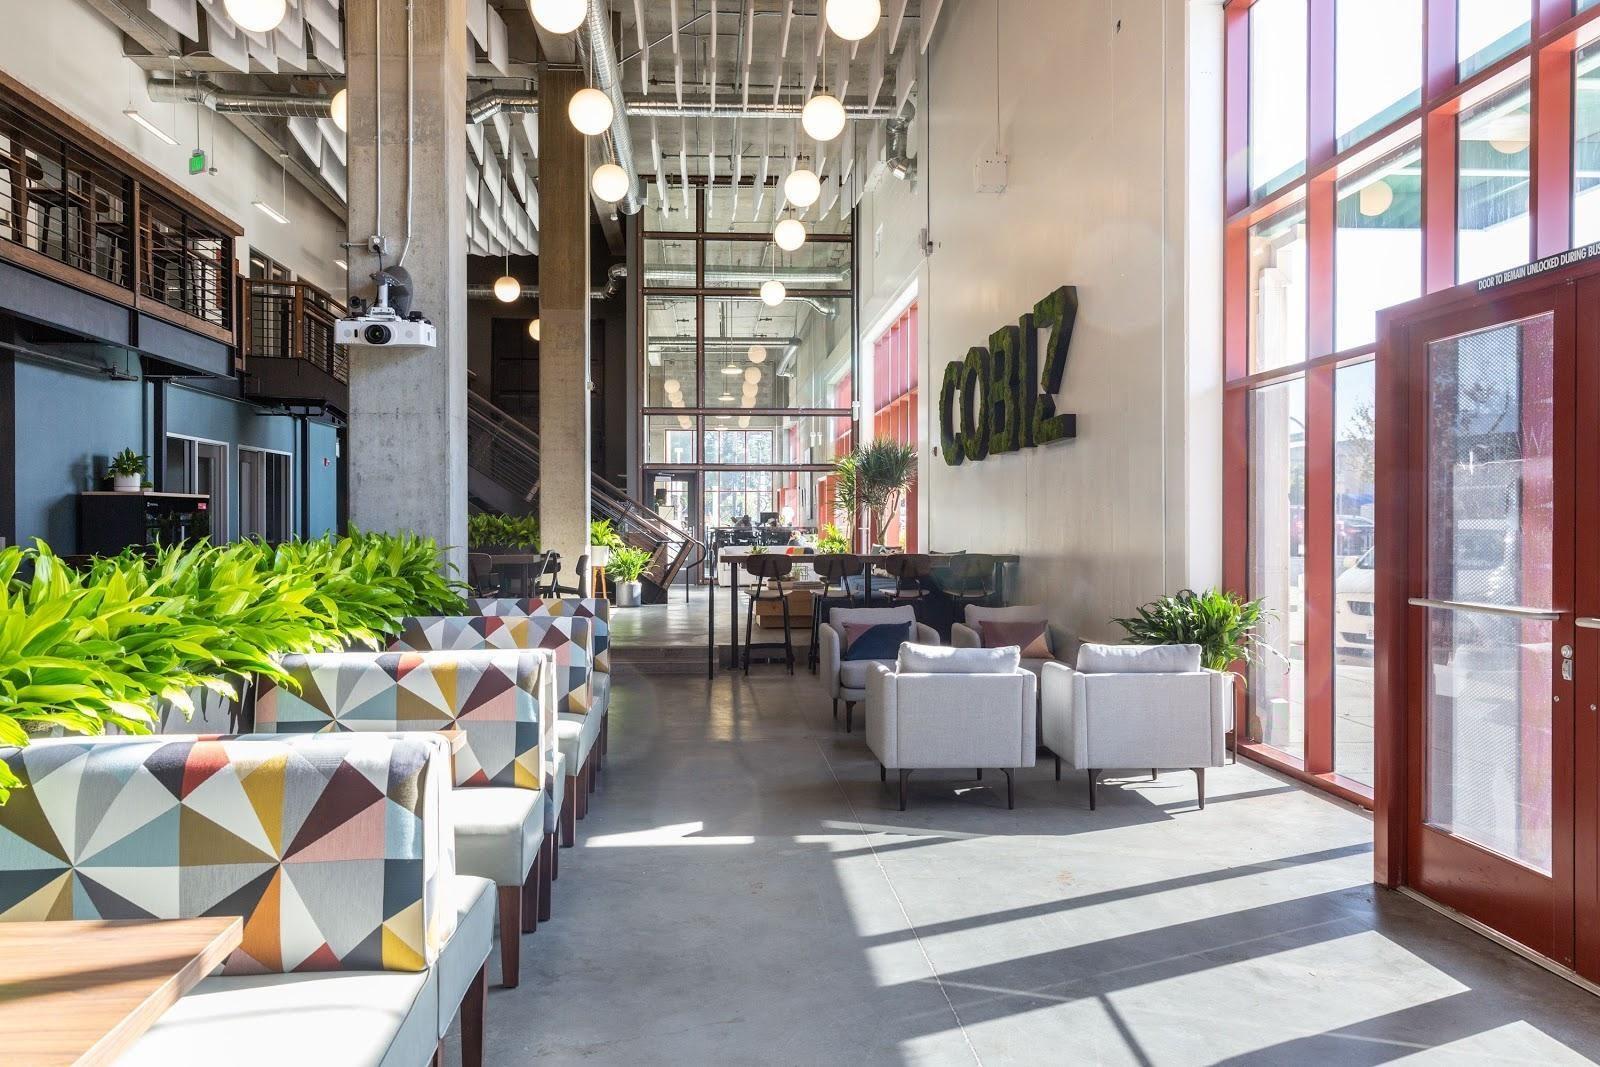 cobiz richmond colorful fabric benches movable planters creative design